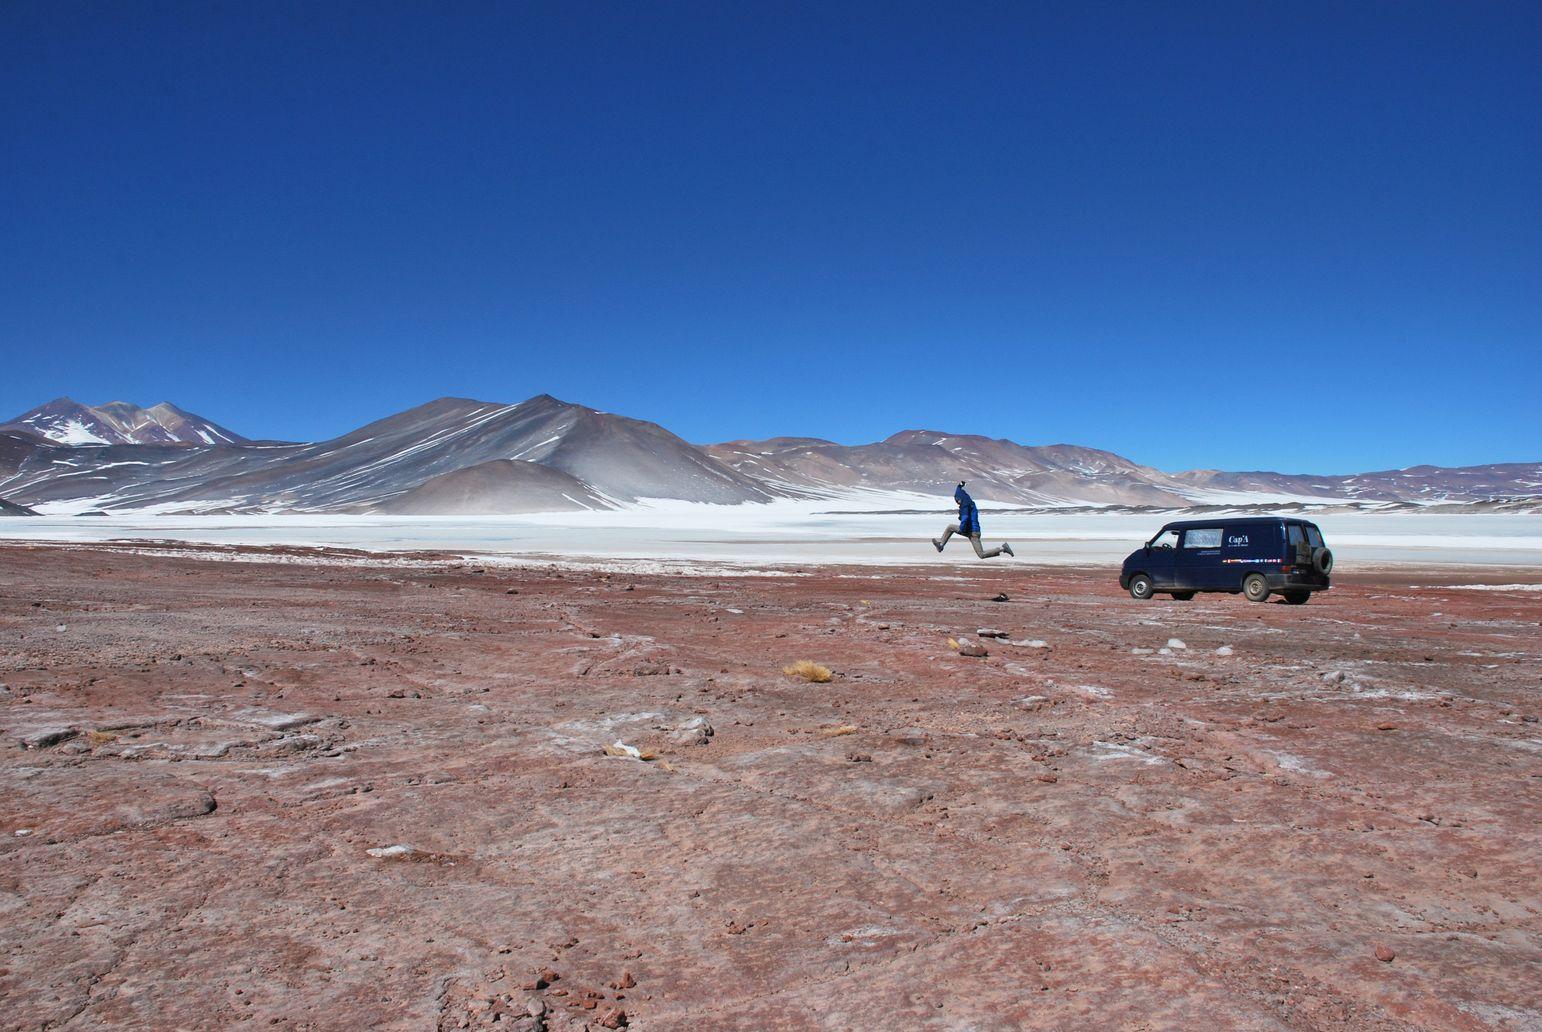 Piedras_Rojas_Atacama